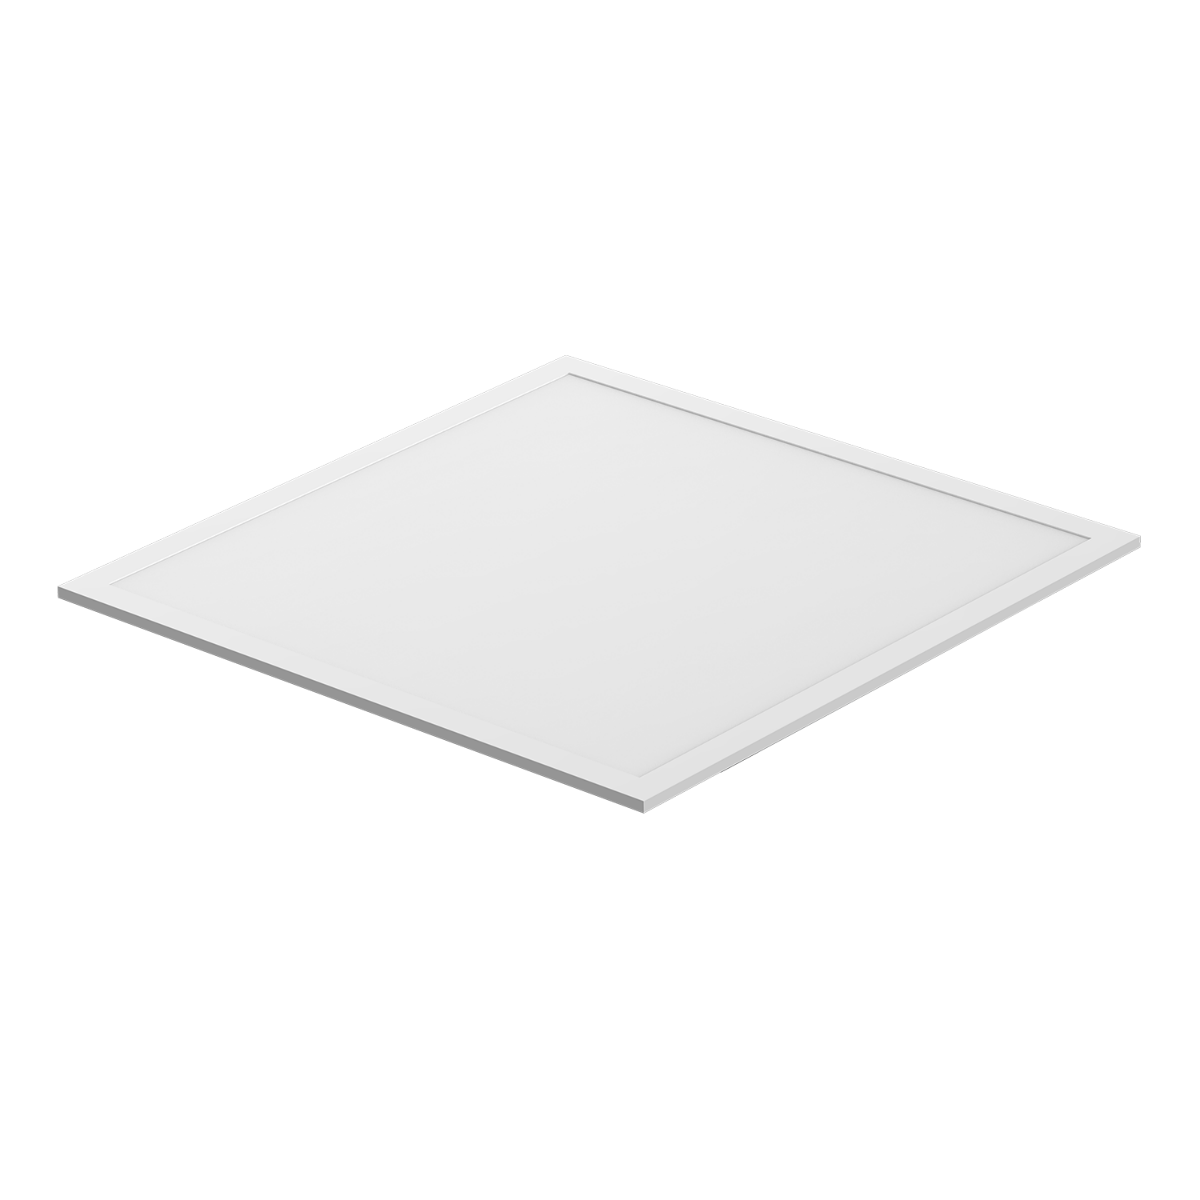 Noxion LED Paneeli Econox 32W Xitanium DALI 60x60cm 6500K 4400lm UGR <22 | Dali Himmennettävä - Päivänvalo Valkoinen - Korvaa 4x18W